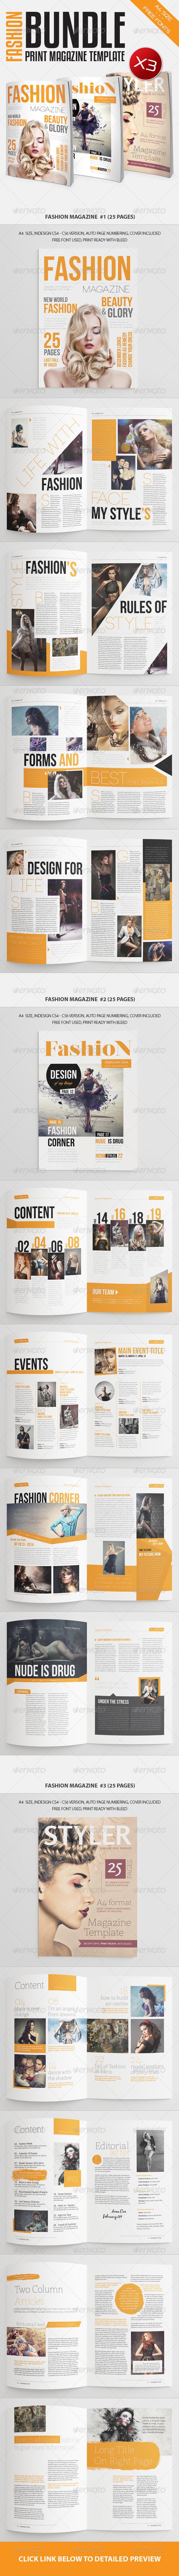 GraphicRiver Fashion Magazine Bundle Vol1 7190401